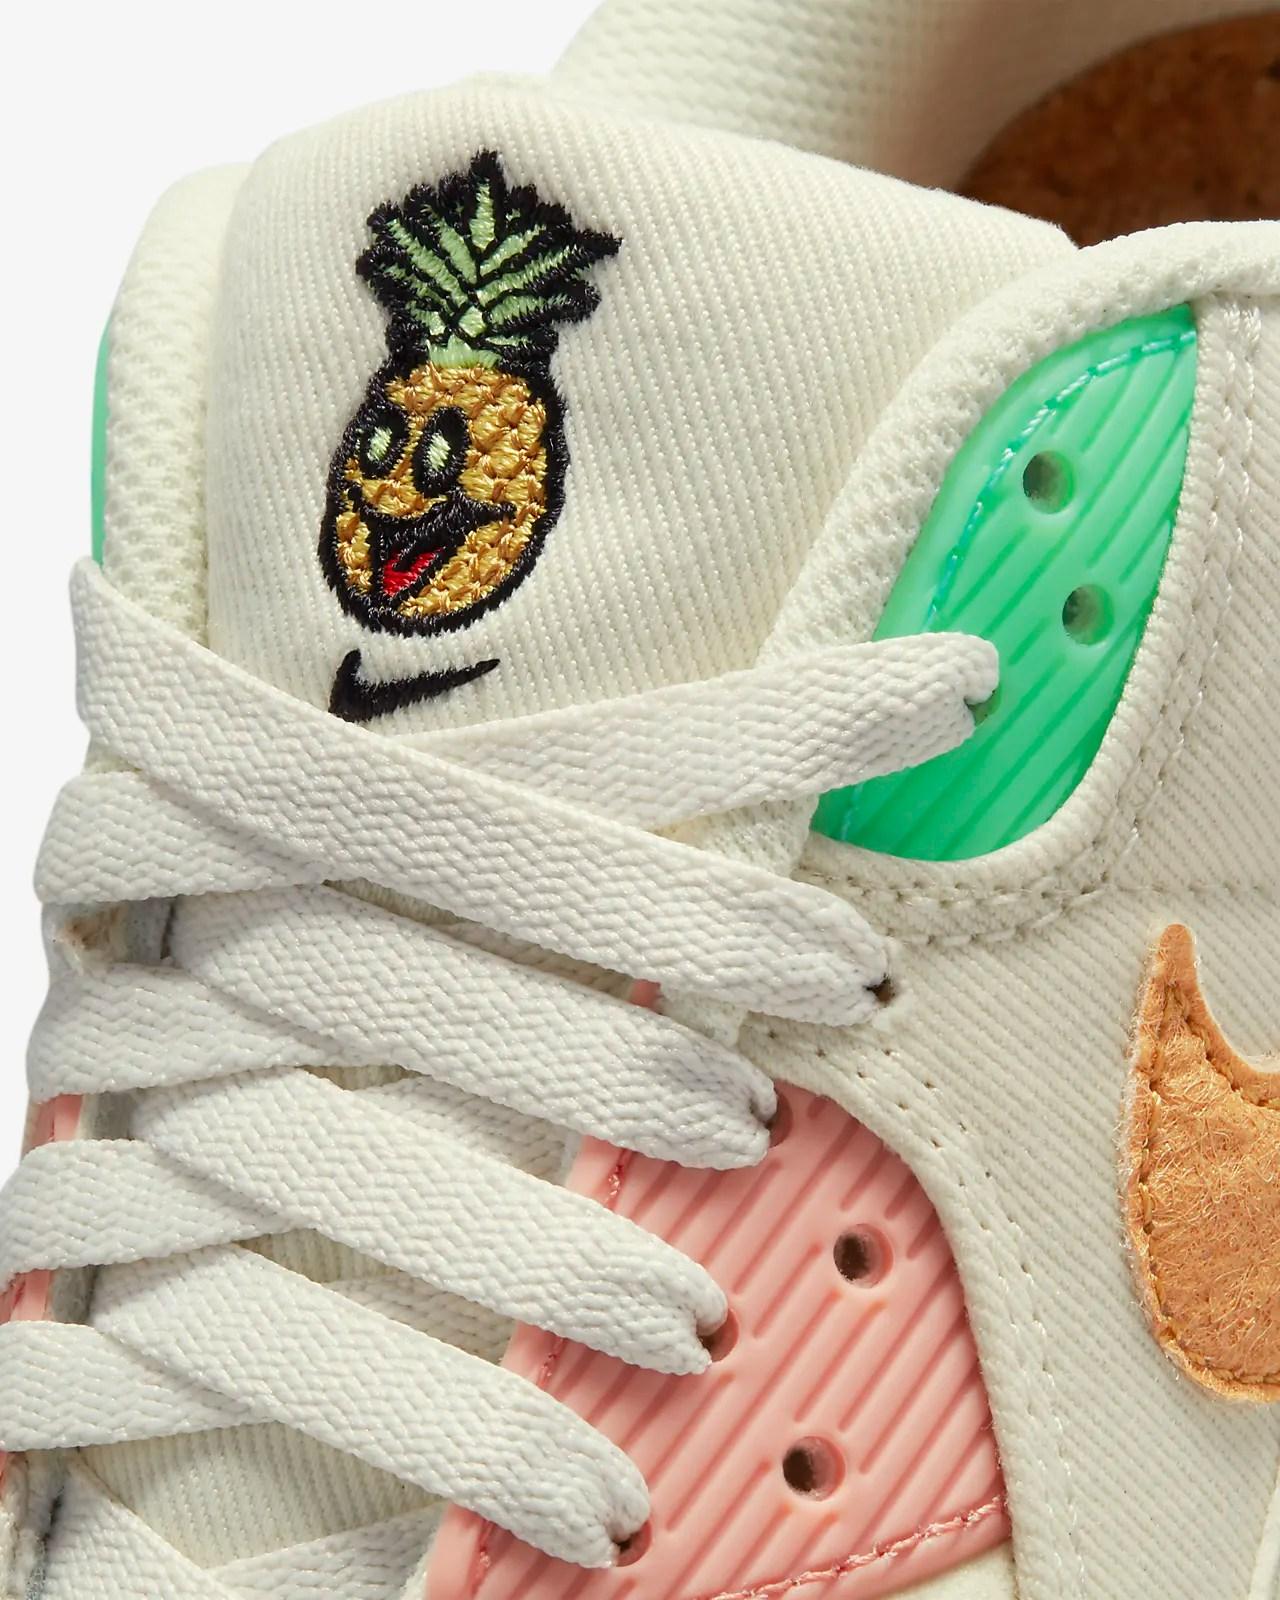 Nike Air Max 90 LX Women's Shoes